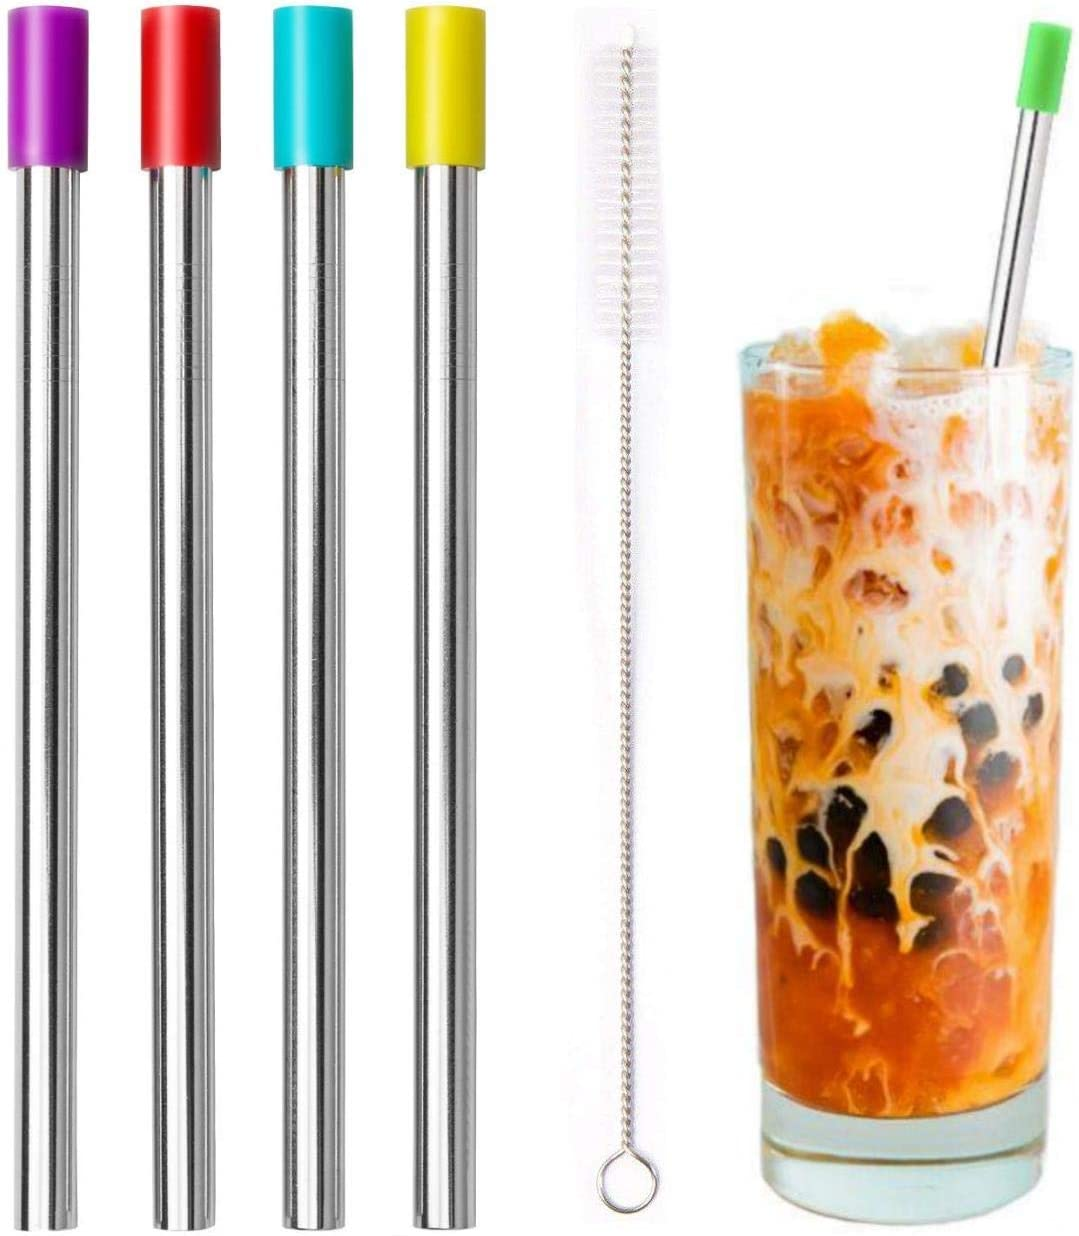 Cocktail Drinking Filter Stick Metal Stainless Steel Tea Spoons Scoop Straw B7U4